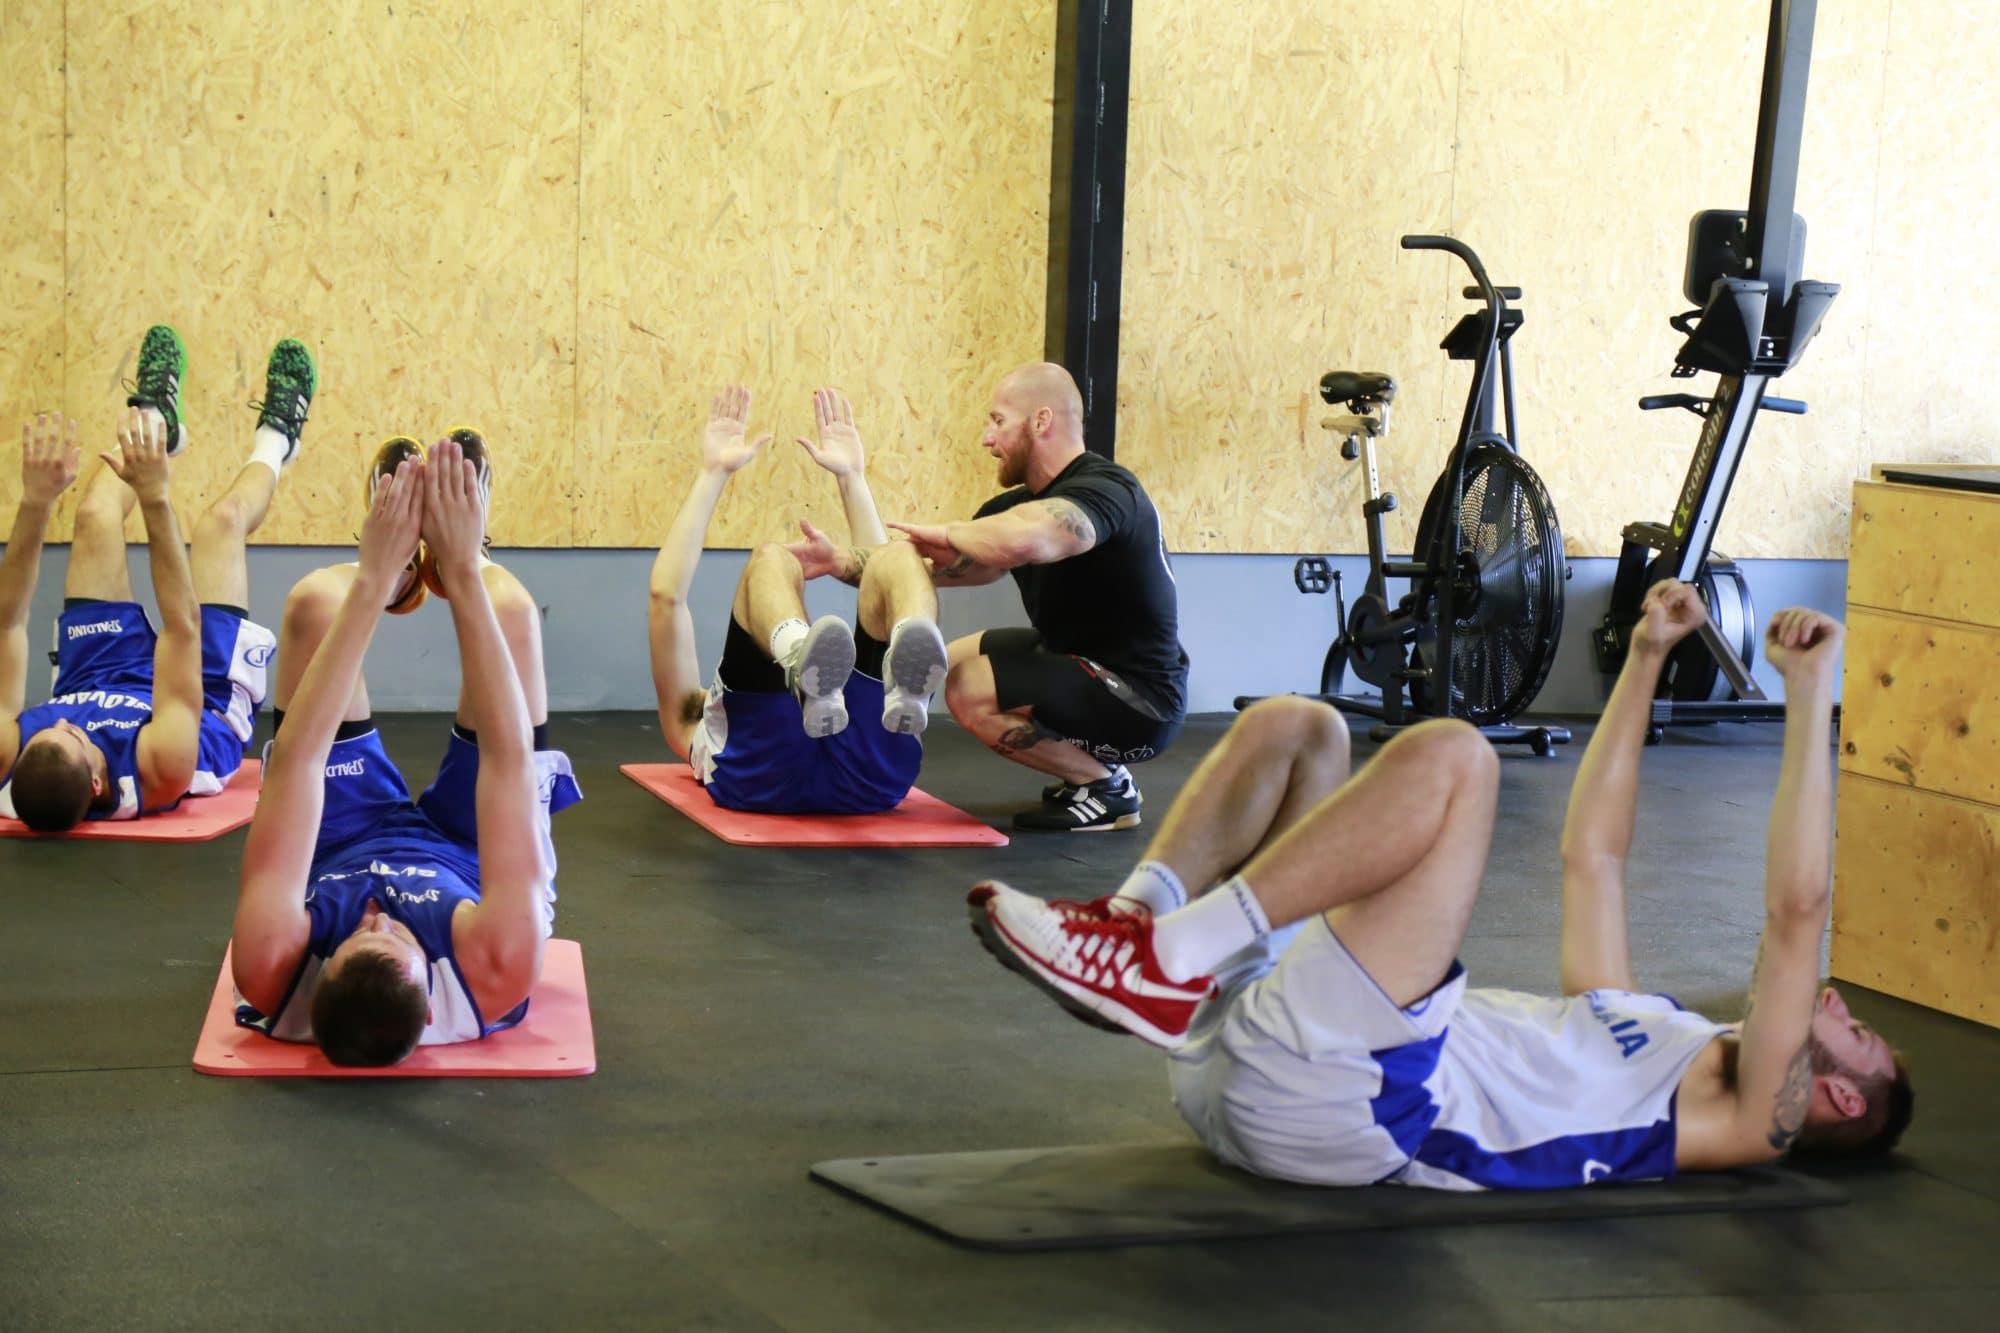 Tréning v CrossGym Core Šamorín